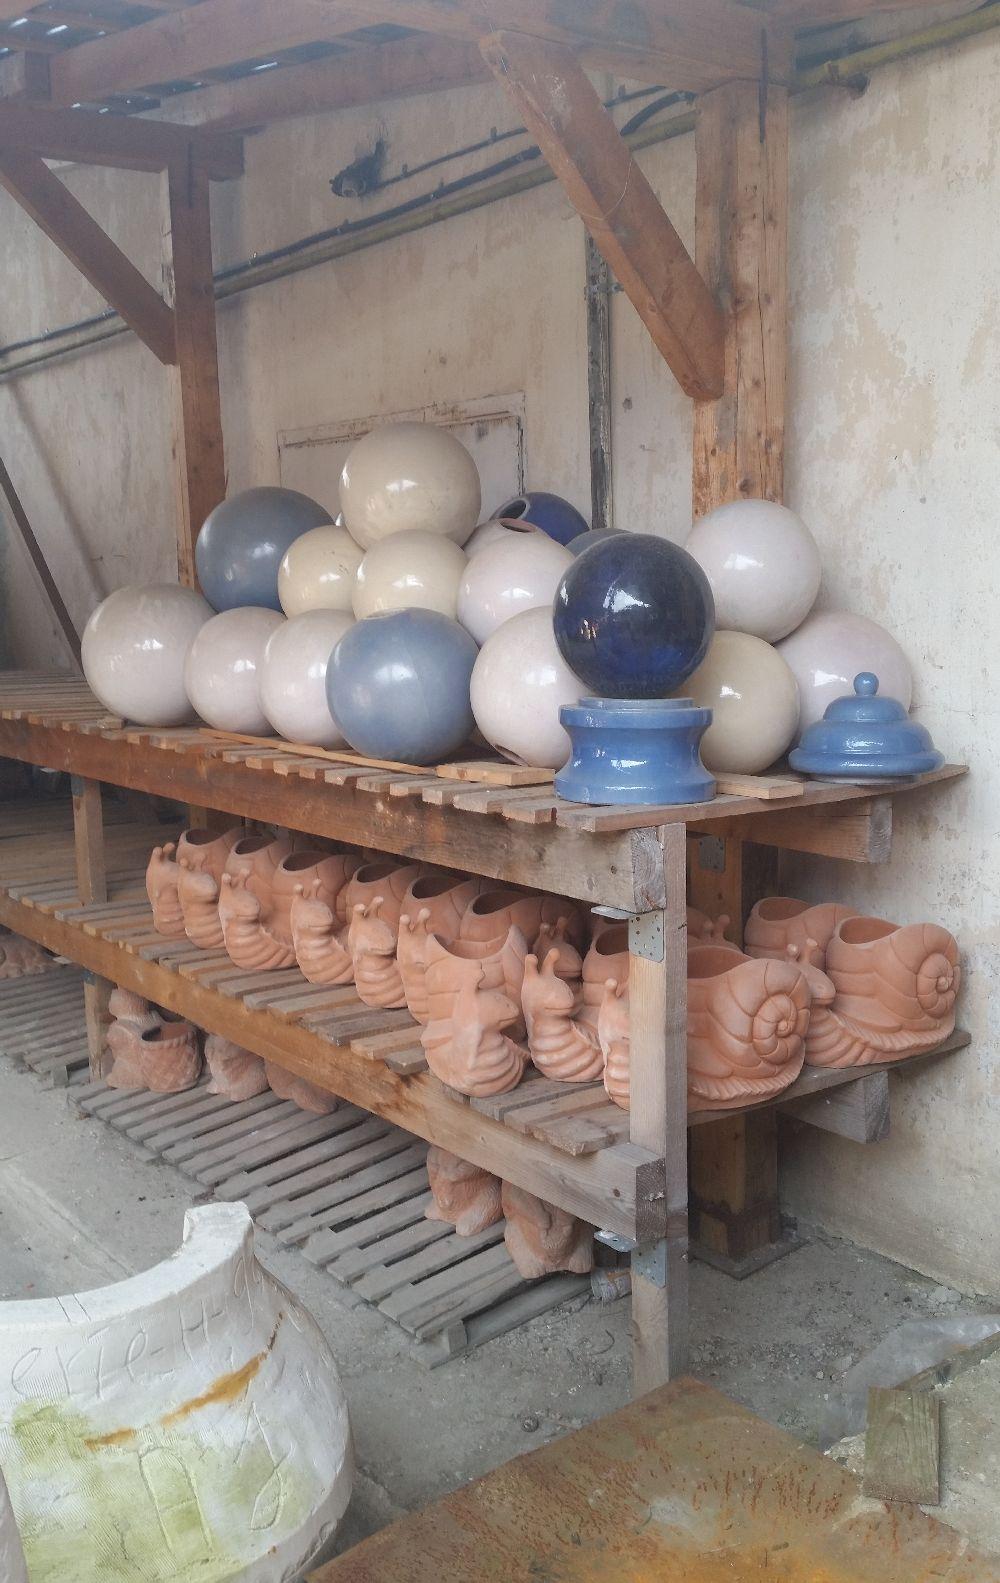 adelaparvu.com despre vase de gradina, ghivece si ornamente din teracota, lut, Terecote Sighisoara Romania (19)